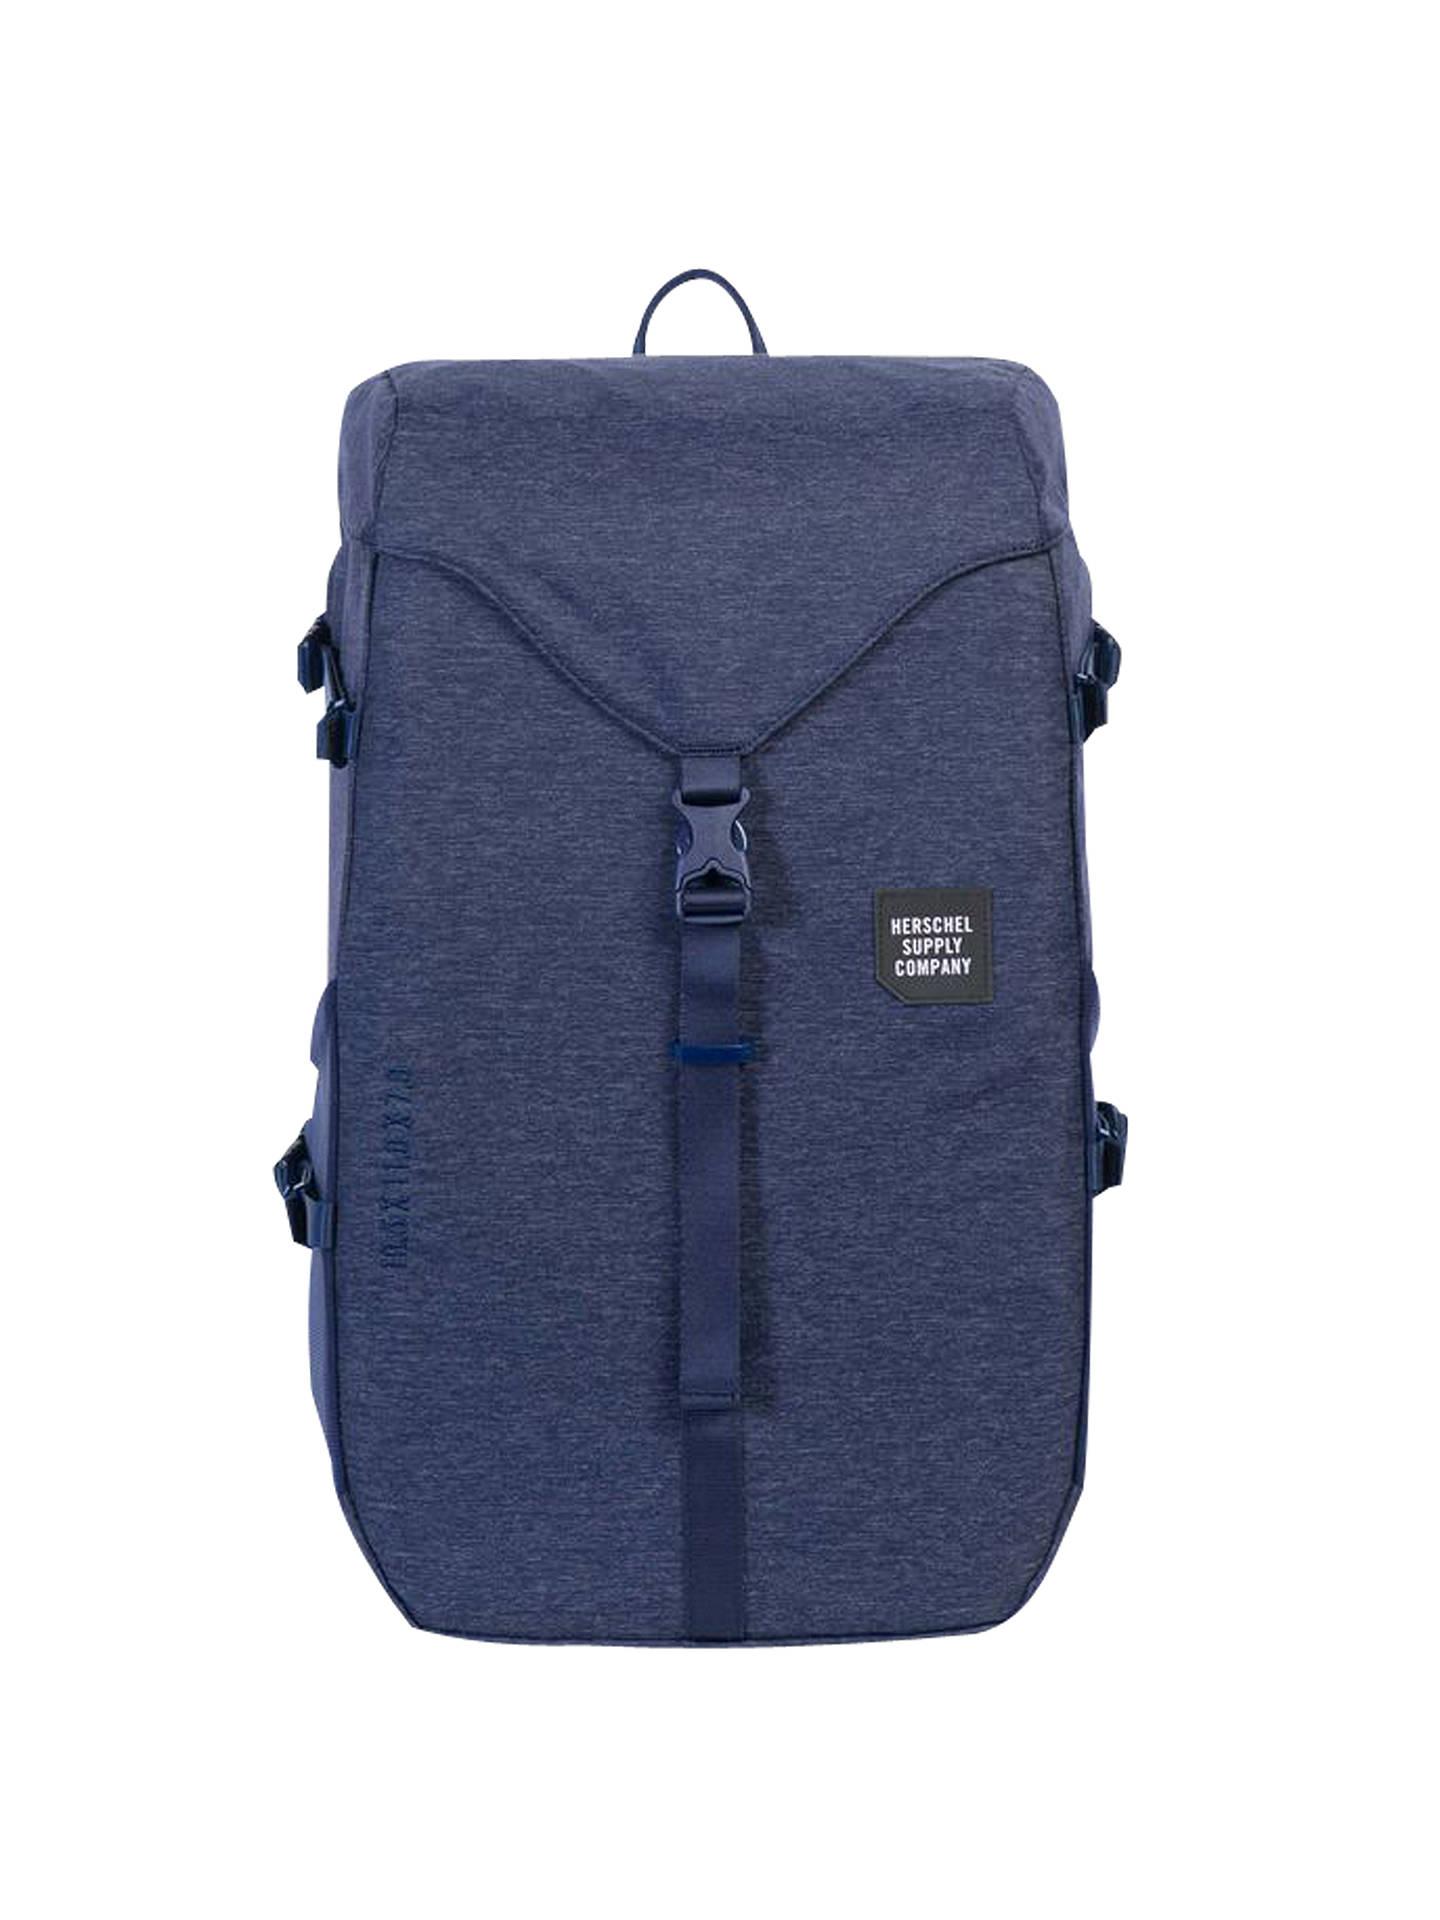 b8fdb9fbfe54 BuyHerschel Suppy Co. Barlow Large Backpack